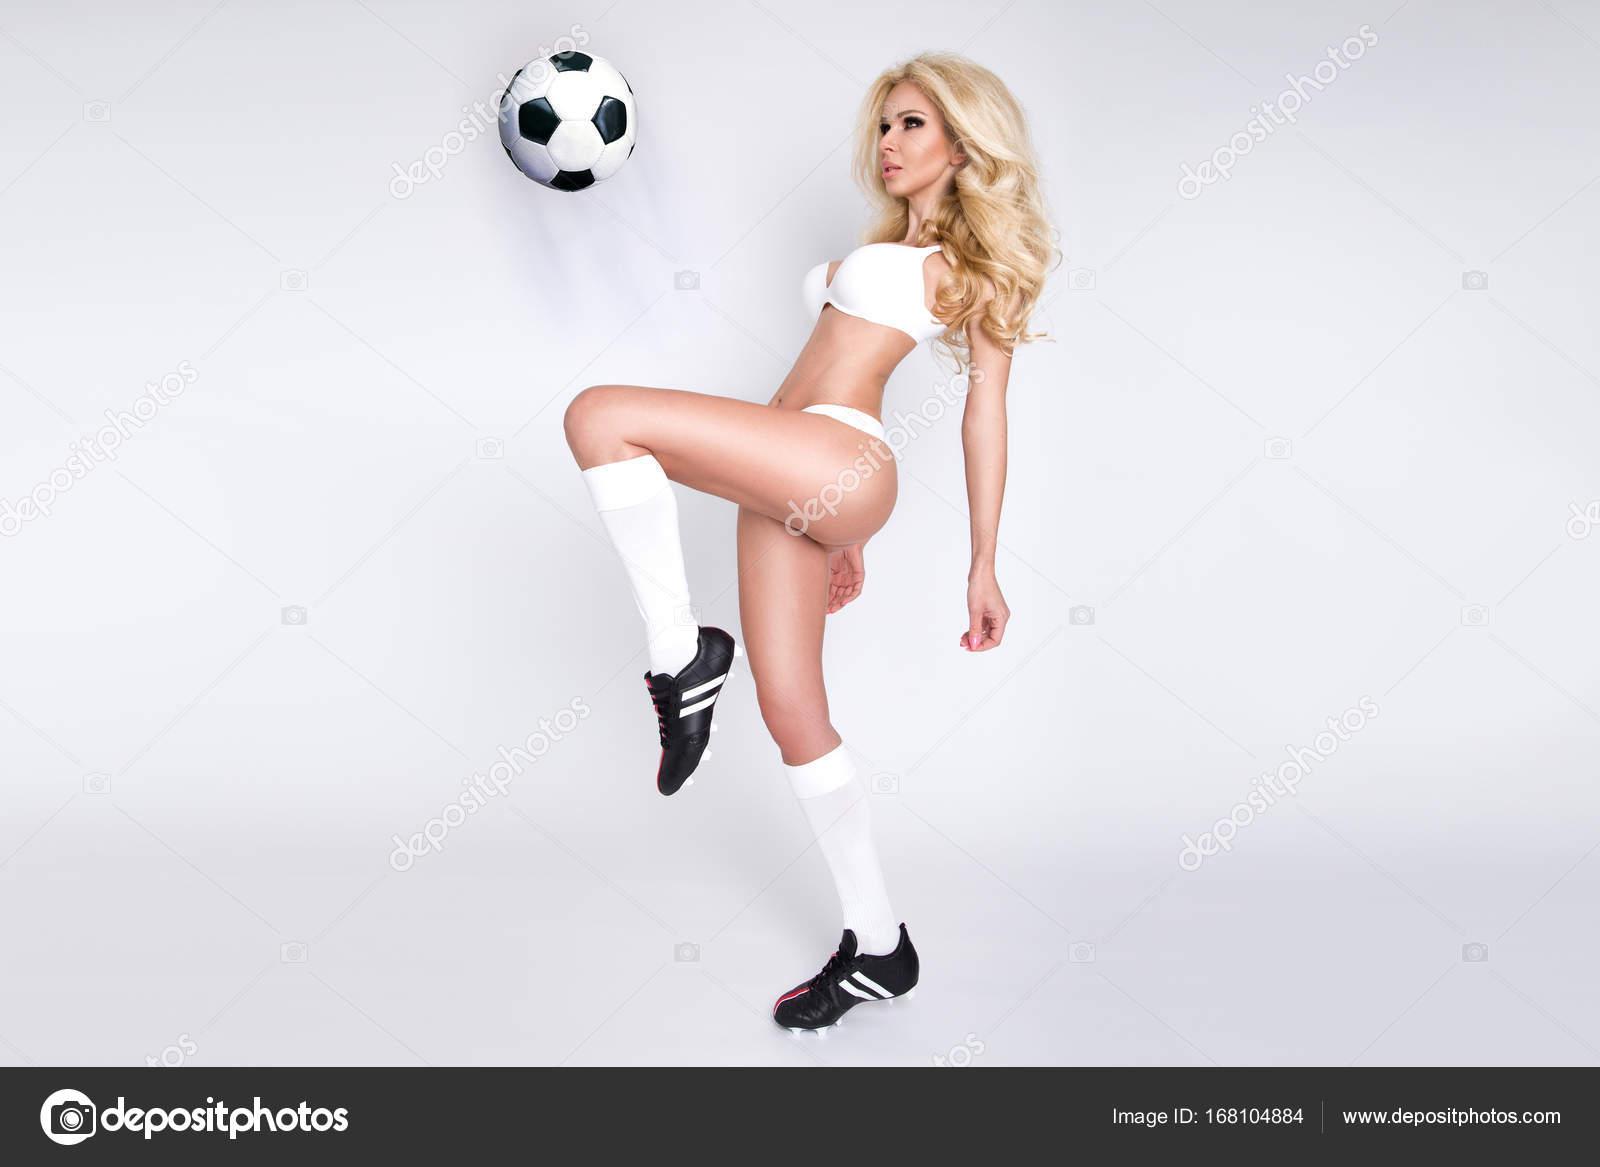 Girls in soccer socks having sex